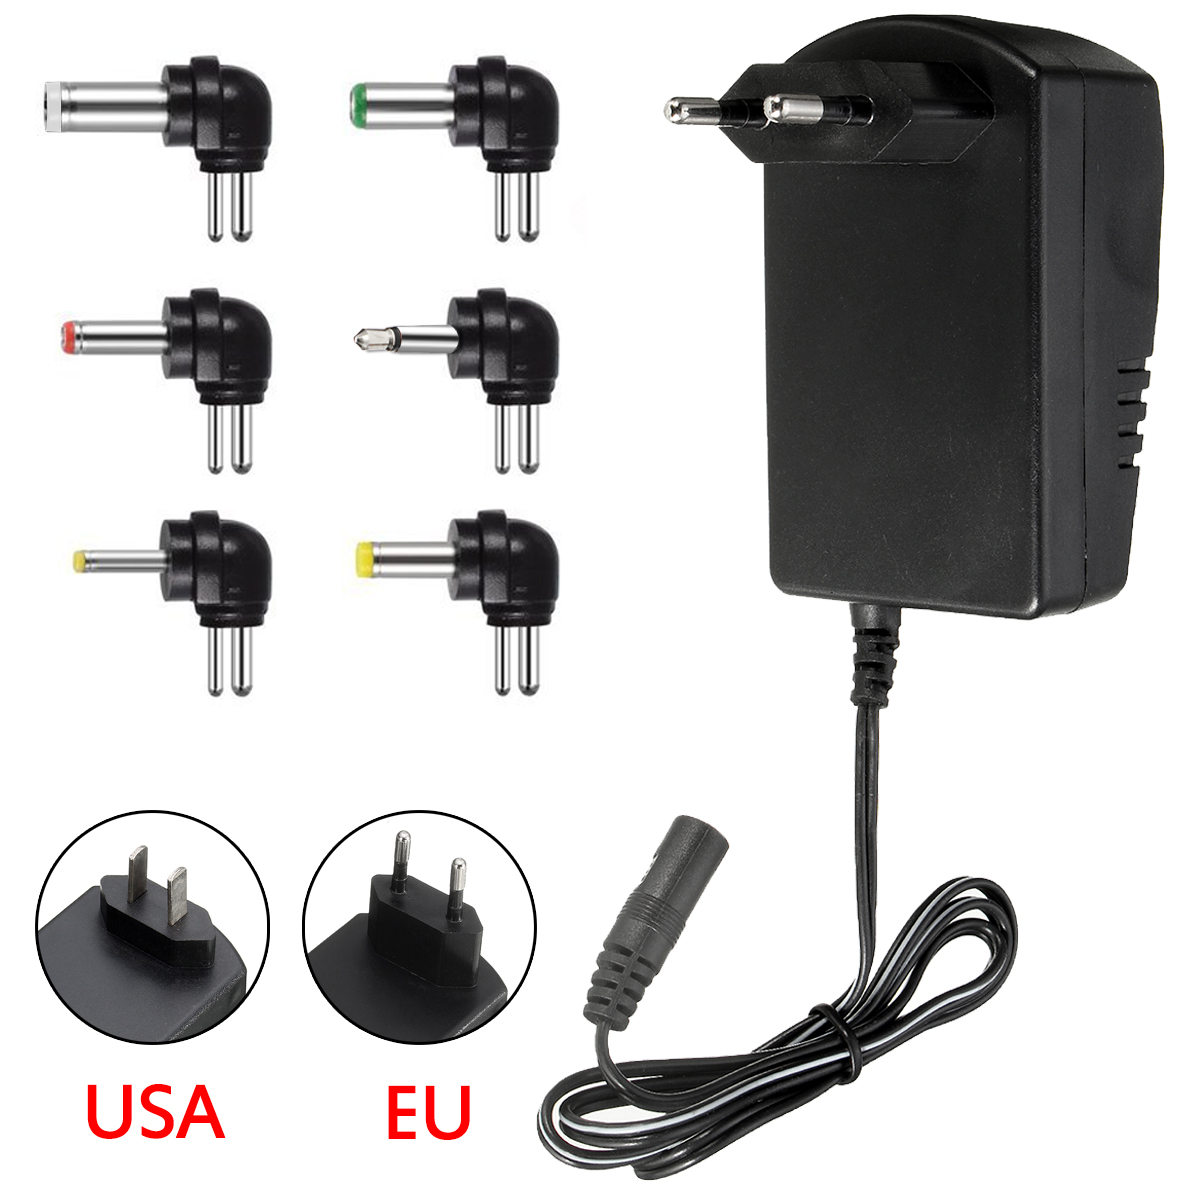 Multi Voltage 3v 4.5v 5v 6v 9v 12v Power Supply Adapter Converter Cable 6 Plugs bo zhang multi terminal high voltage converter